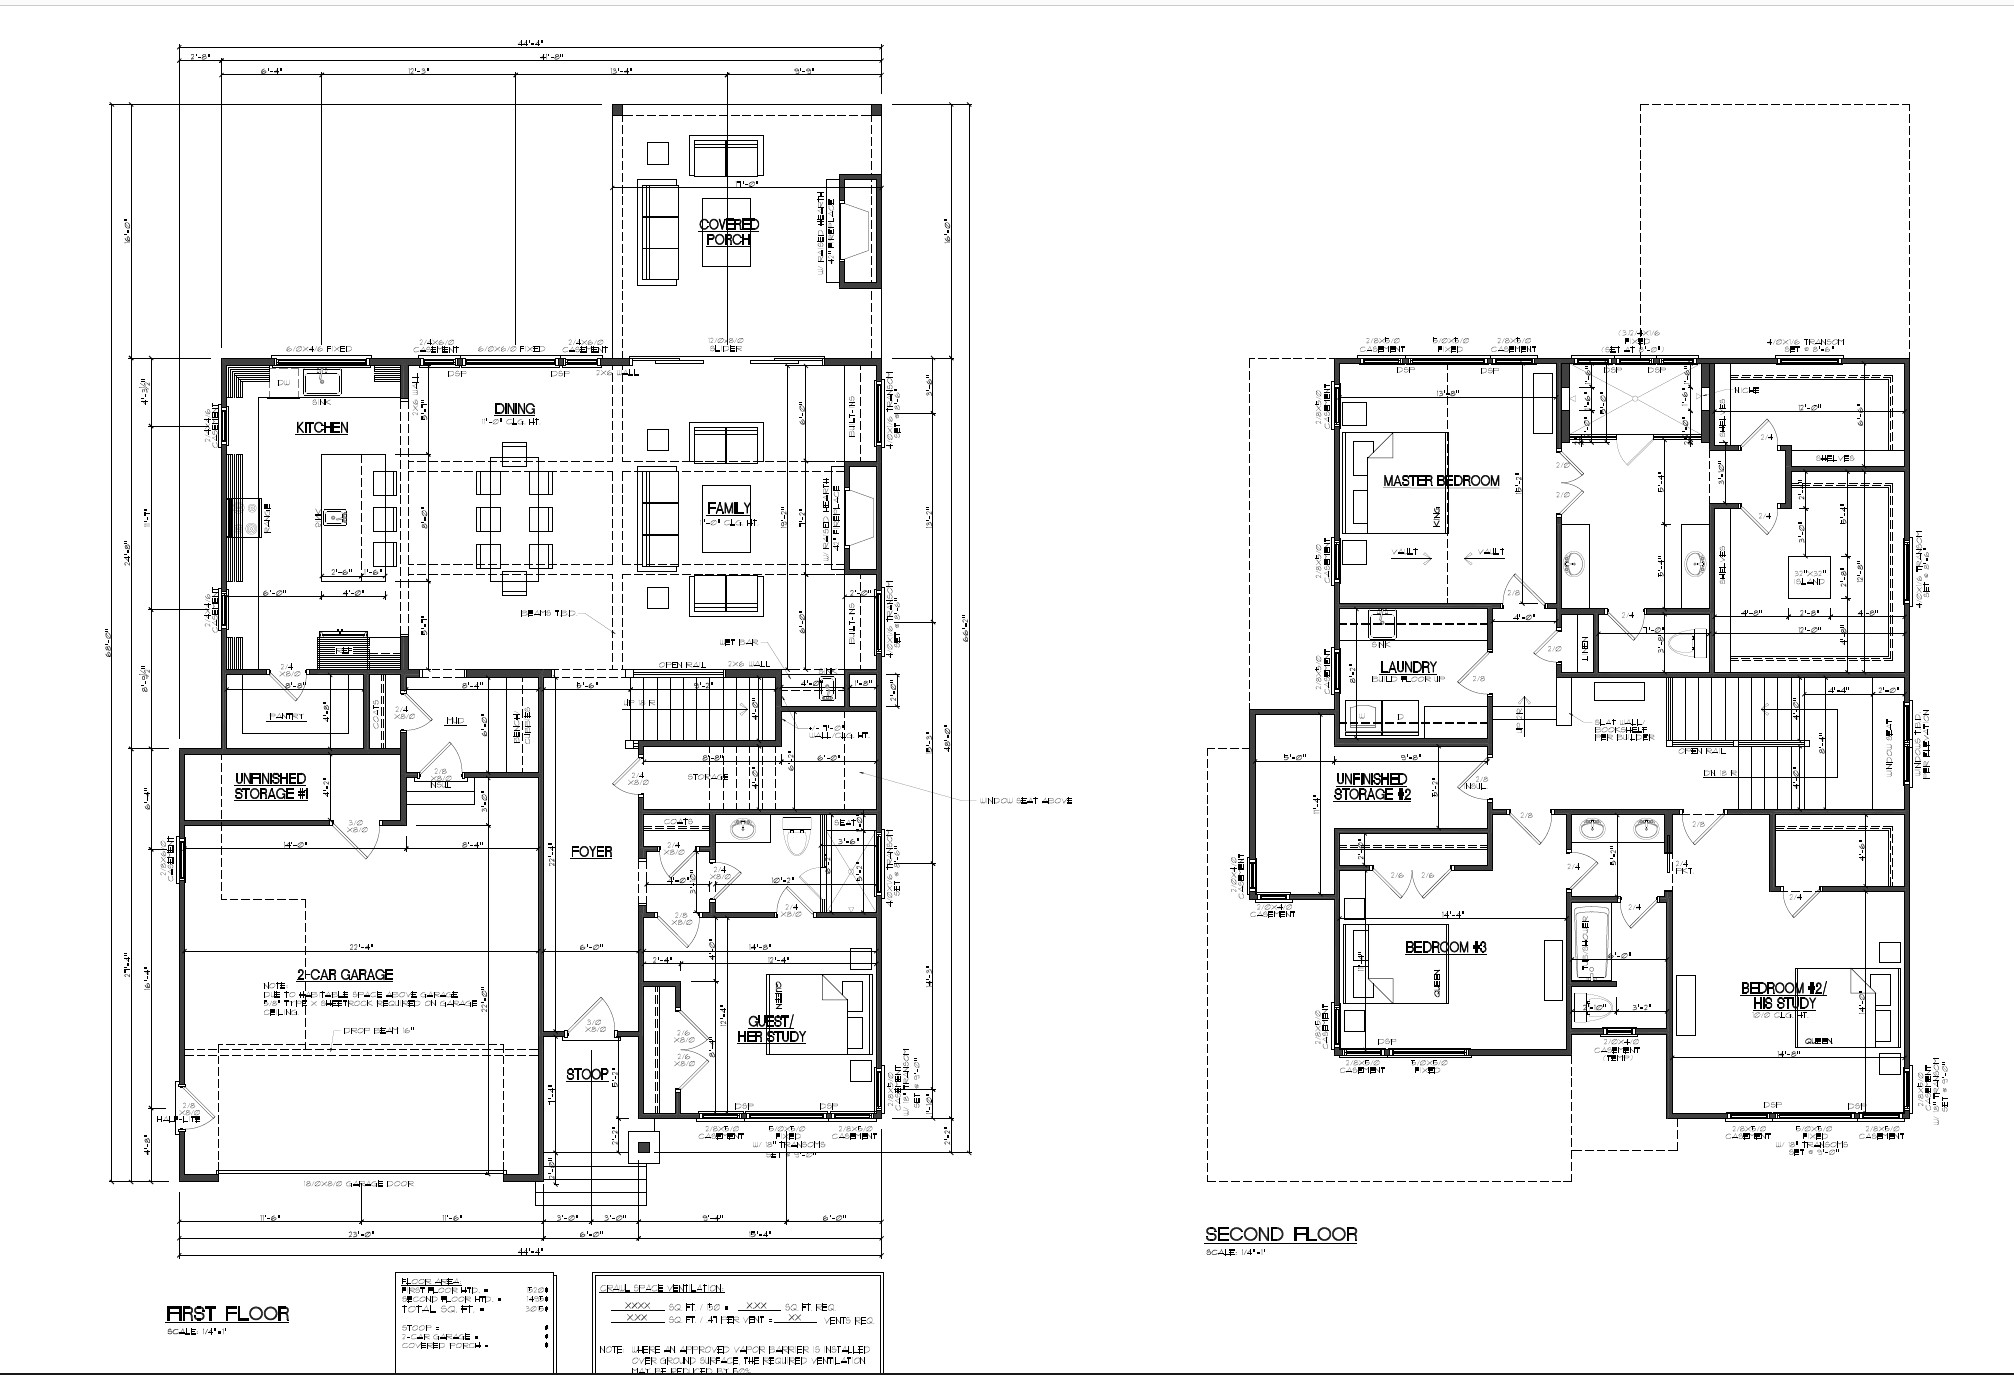 Pfeffer_floorplan.jpg